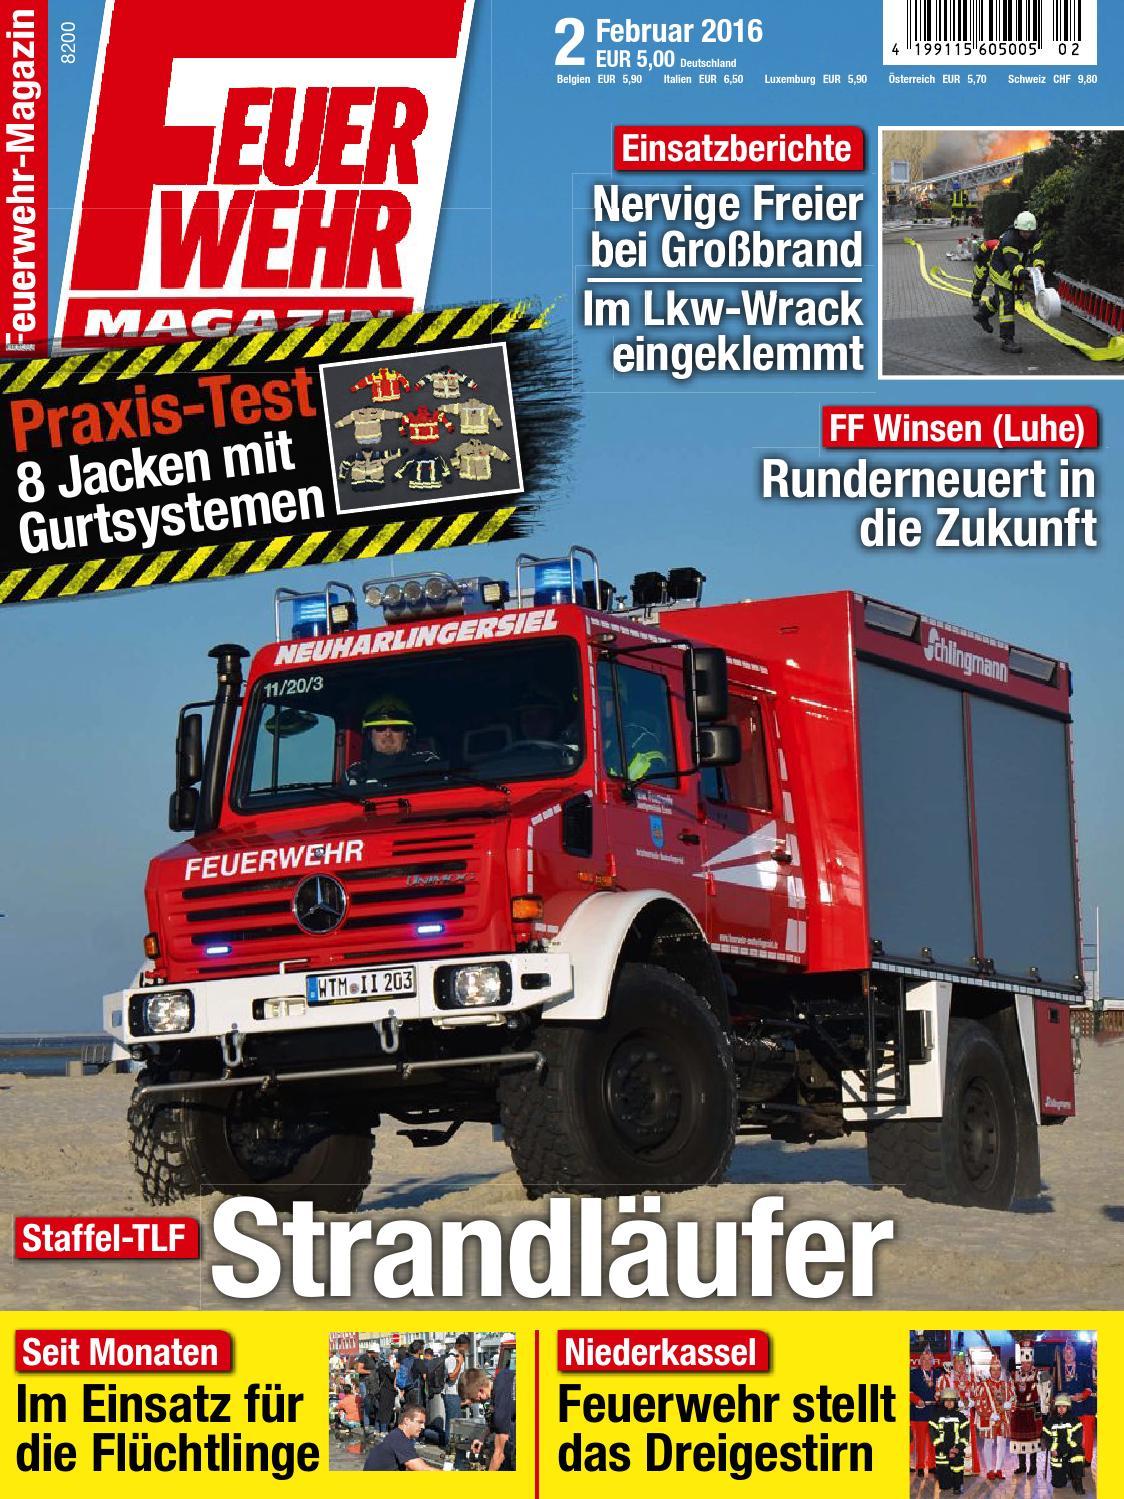 Feuerwehr magazin april 2015 by Augusto Dantas - issuu